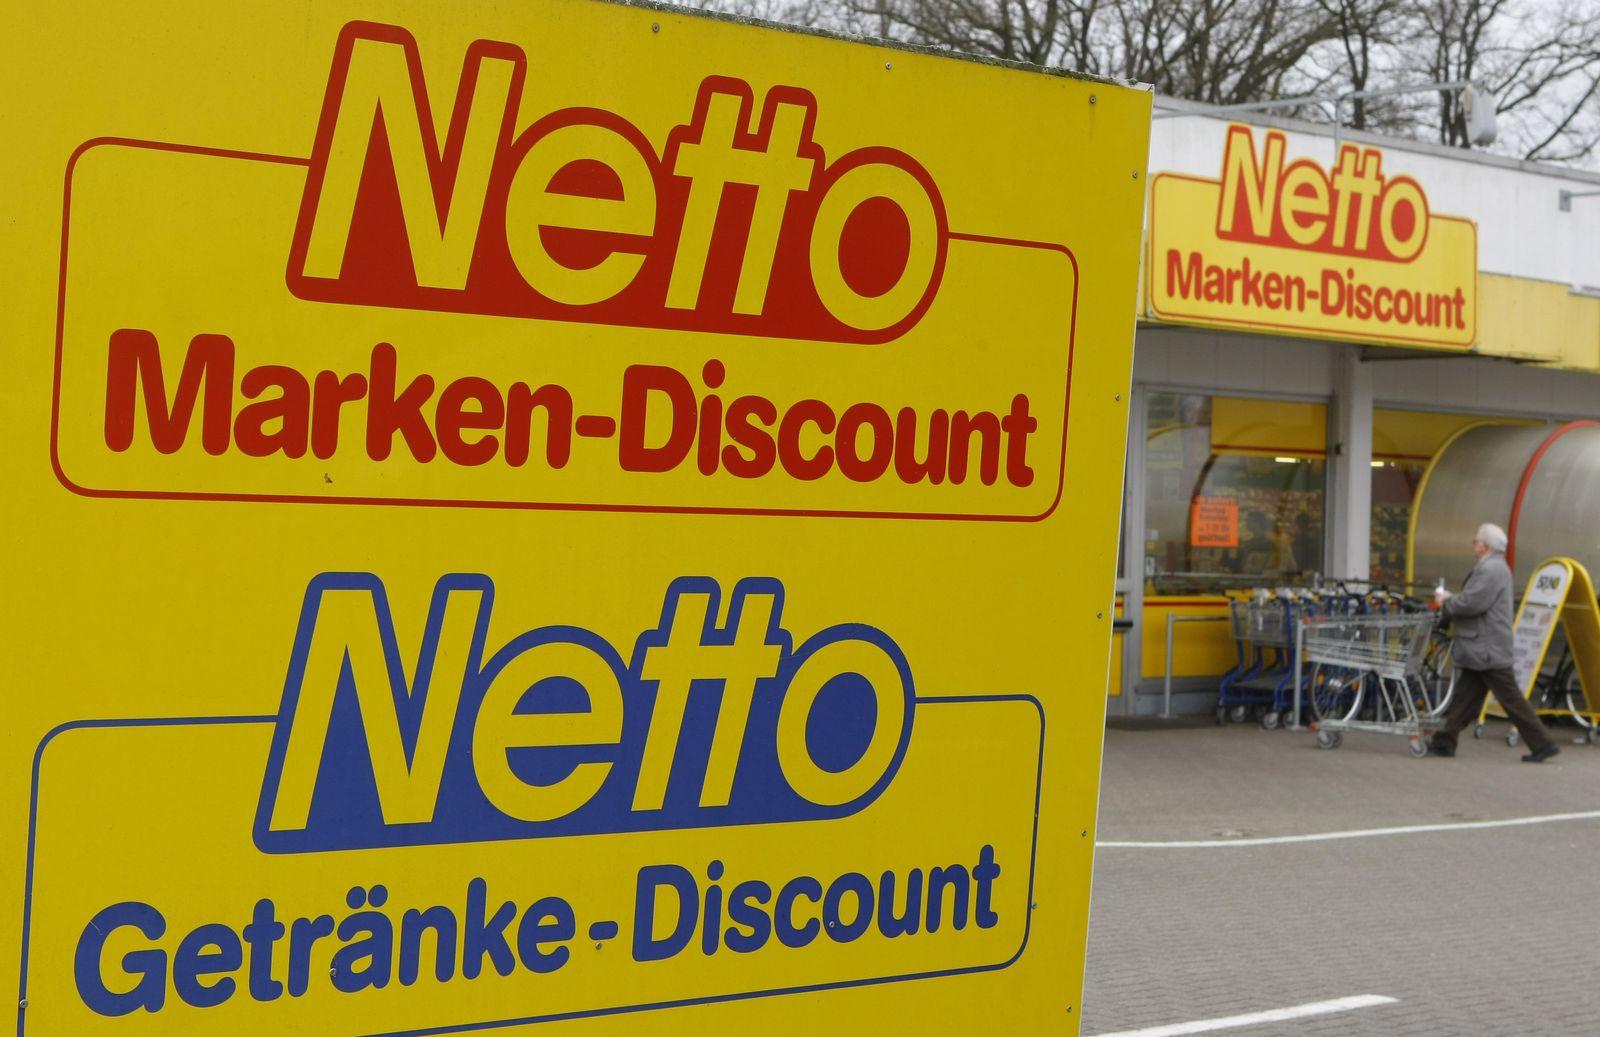 Netto-Mark / Getränke-Discount